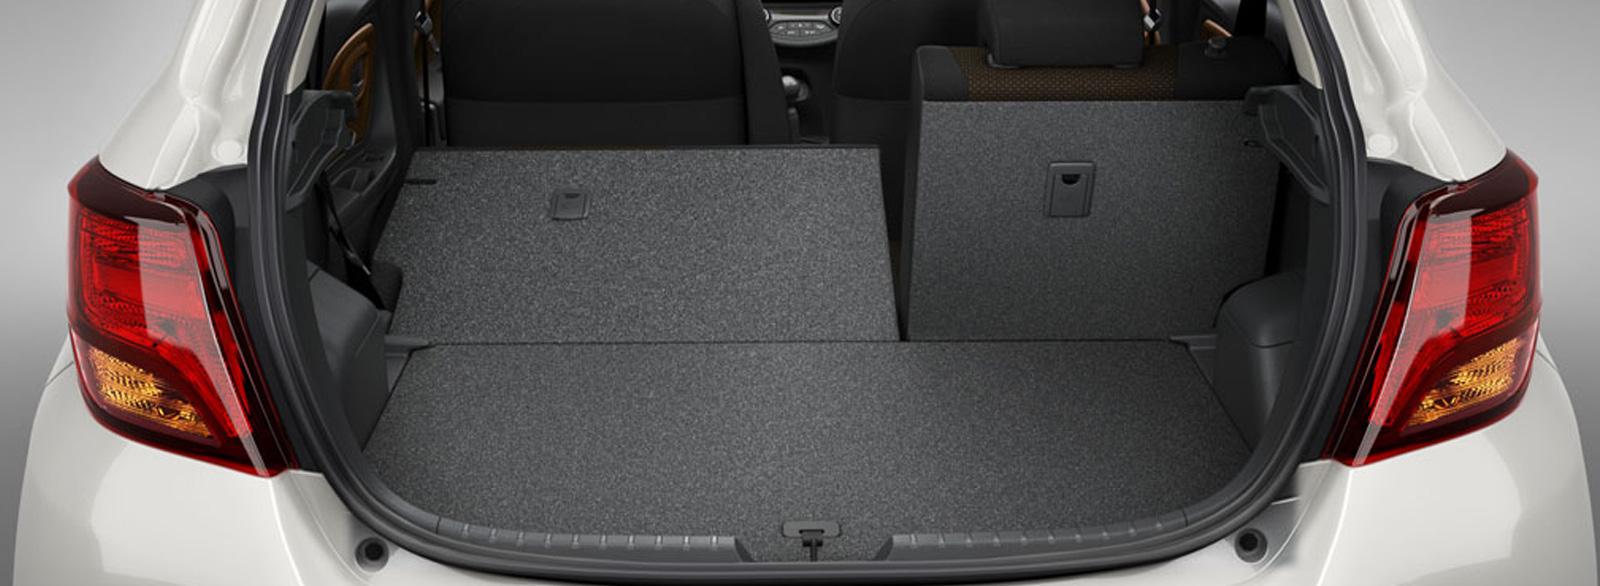 yaris-hb-interior-new-8